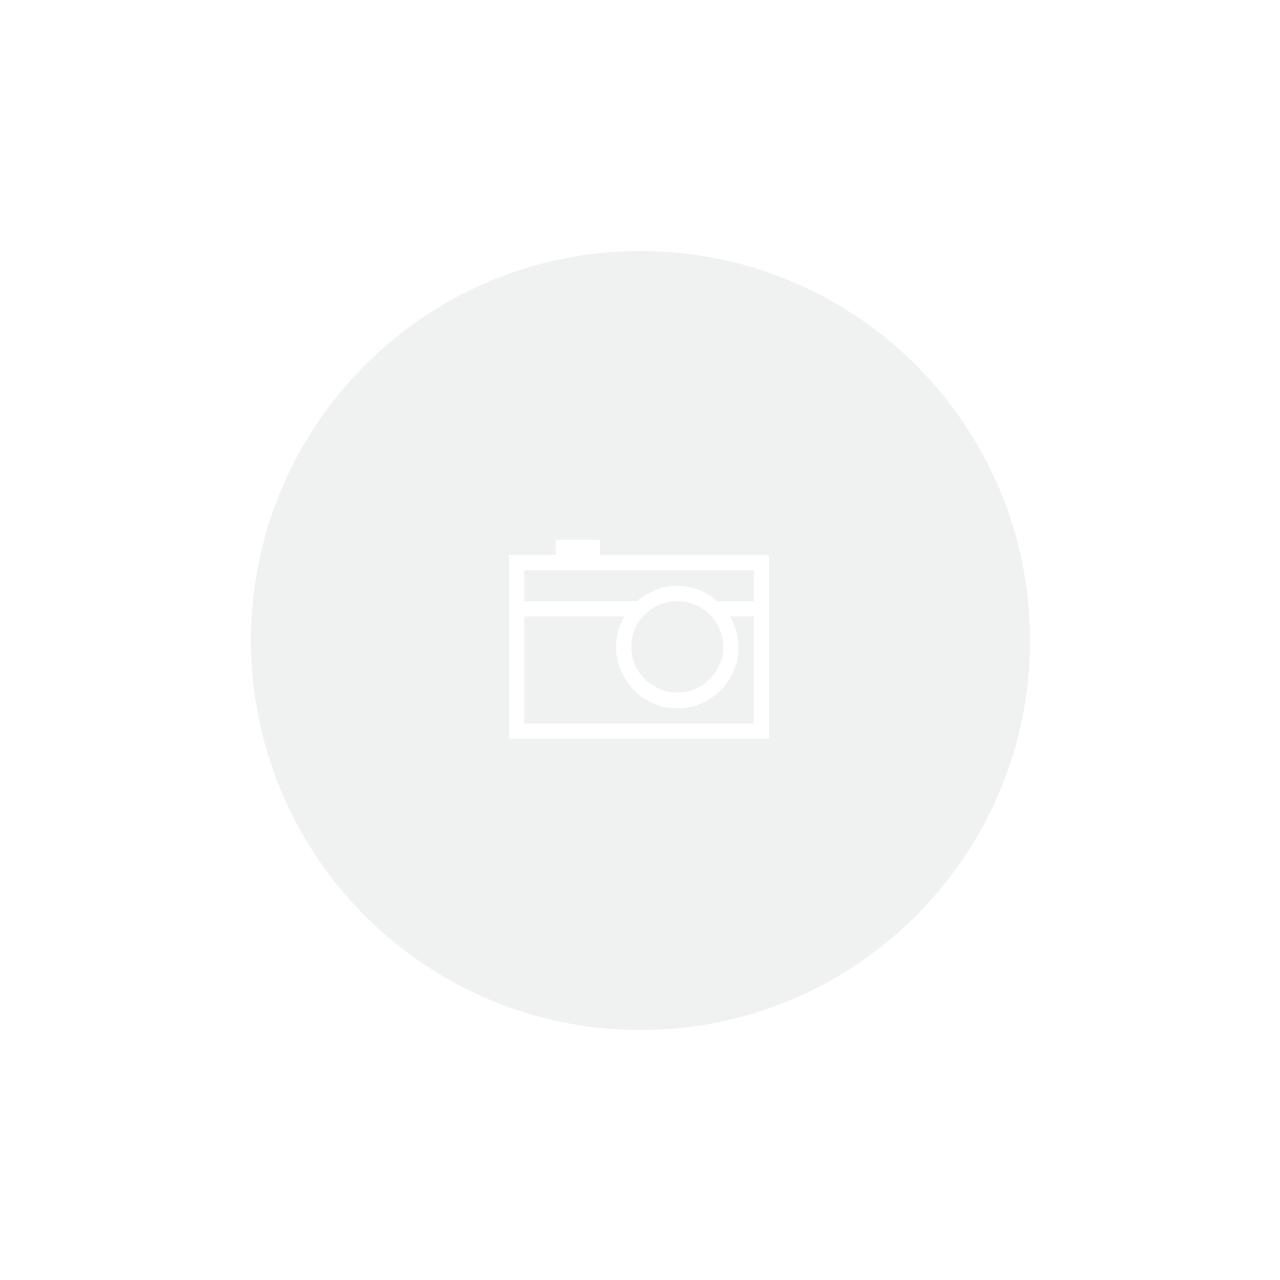 PNEU 16X1.75 DSI SRI61 BORBOLETA